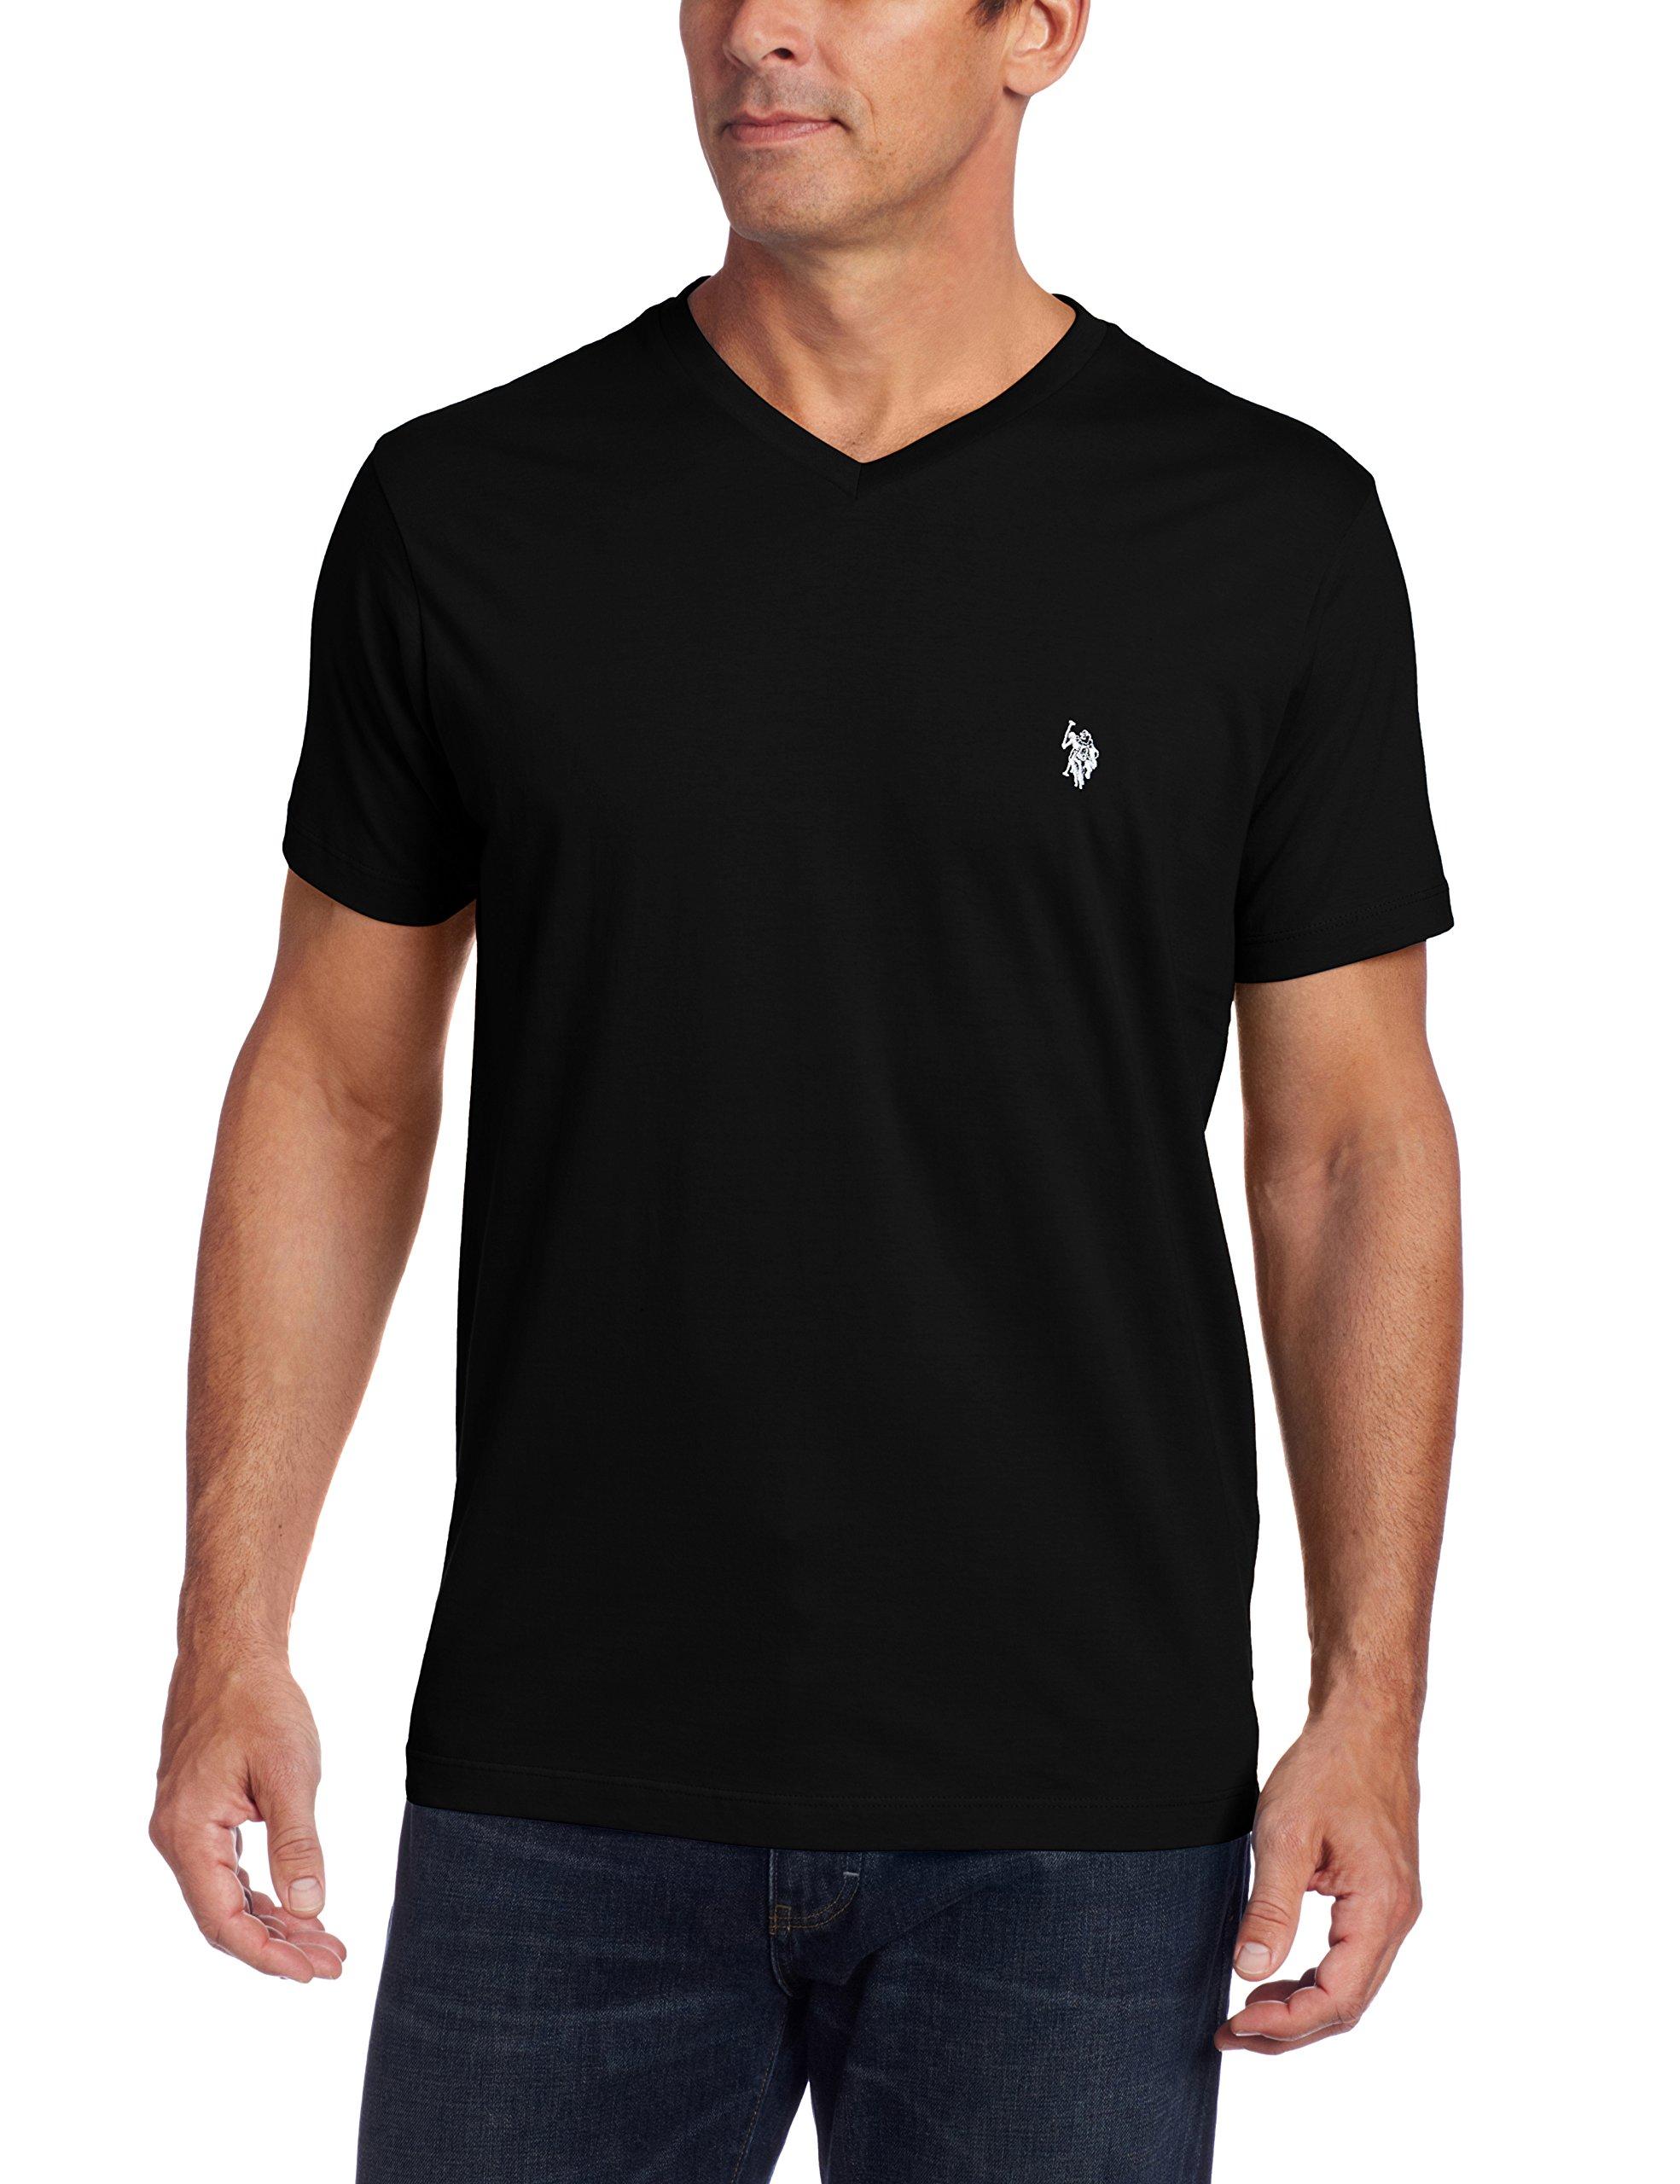 U.S. Polo Assn. Men's Solid T-Shirt, Black, XX-Large